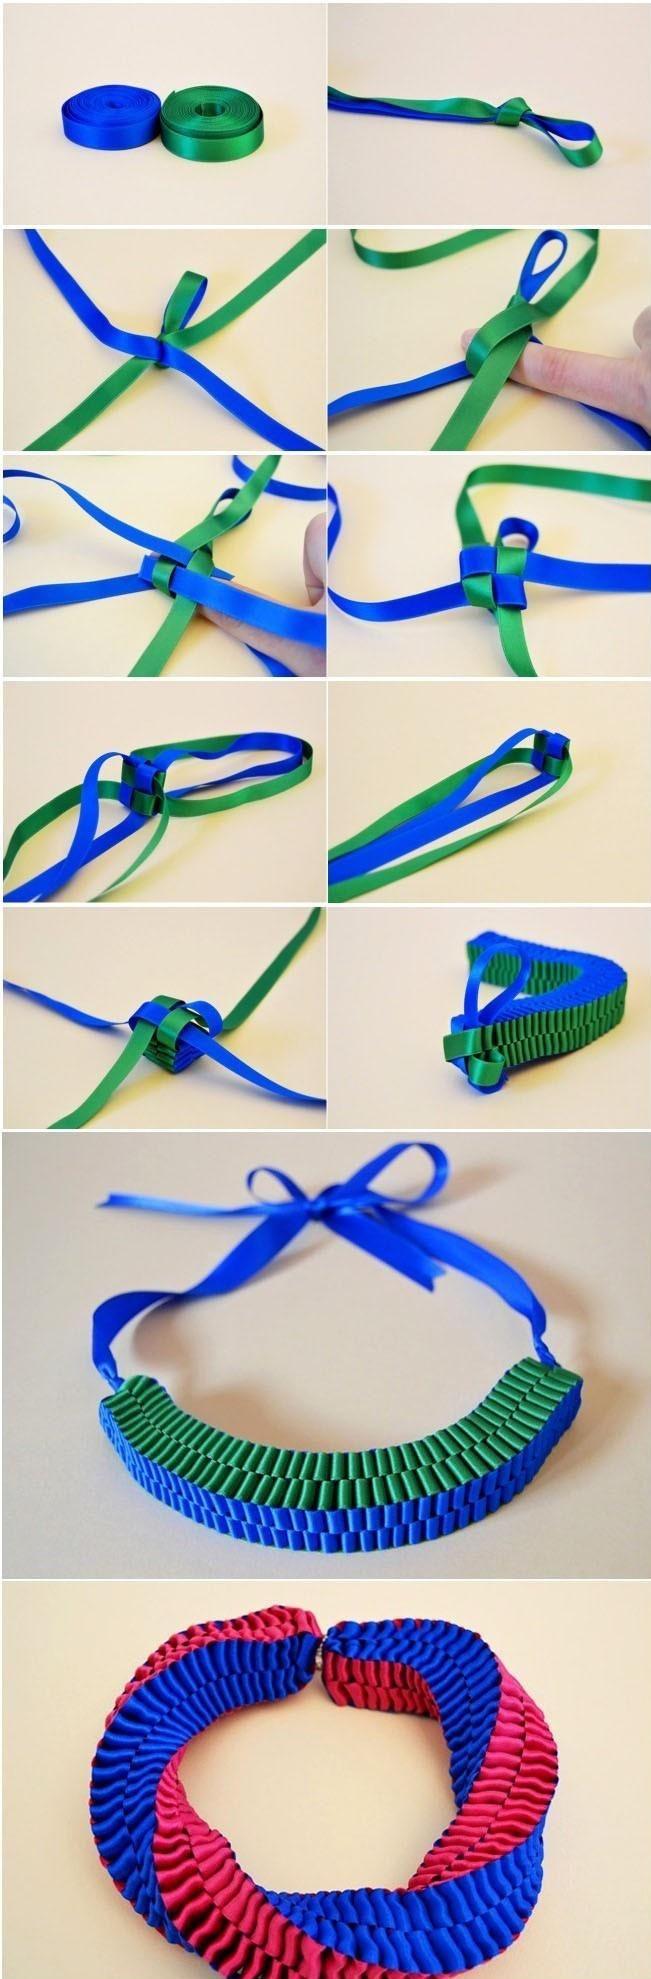 DIY Statement Ribbon Necklace/Bracelet by style.it via joypng Here is the original post http://www.style.it/moda/svaghi/2012/05/25/do-it-yourself.aspx#--Gallery_57833 #DIY #Bracelet #Ribbon